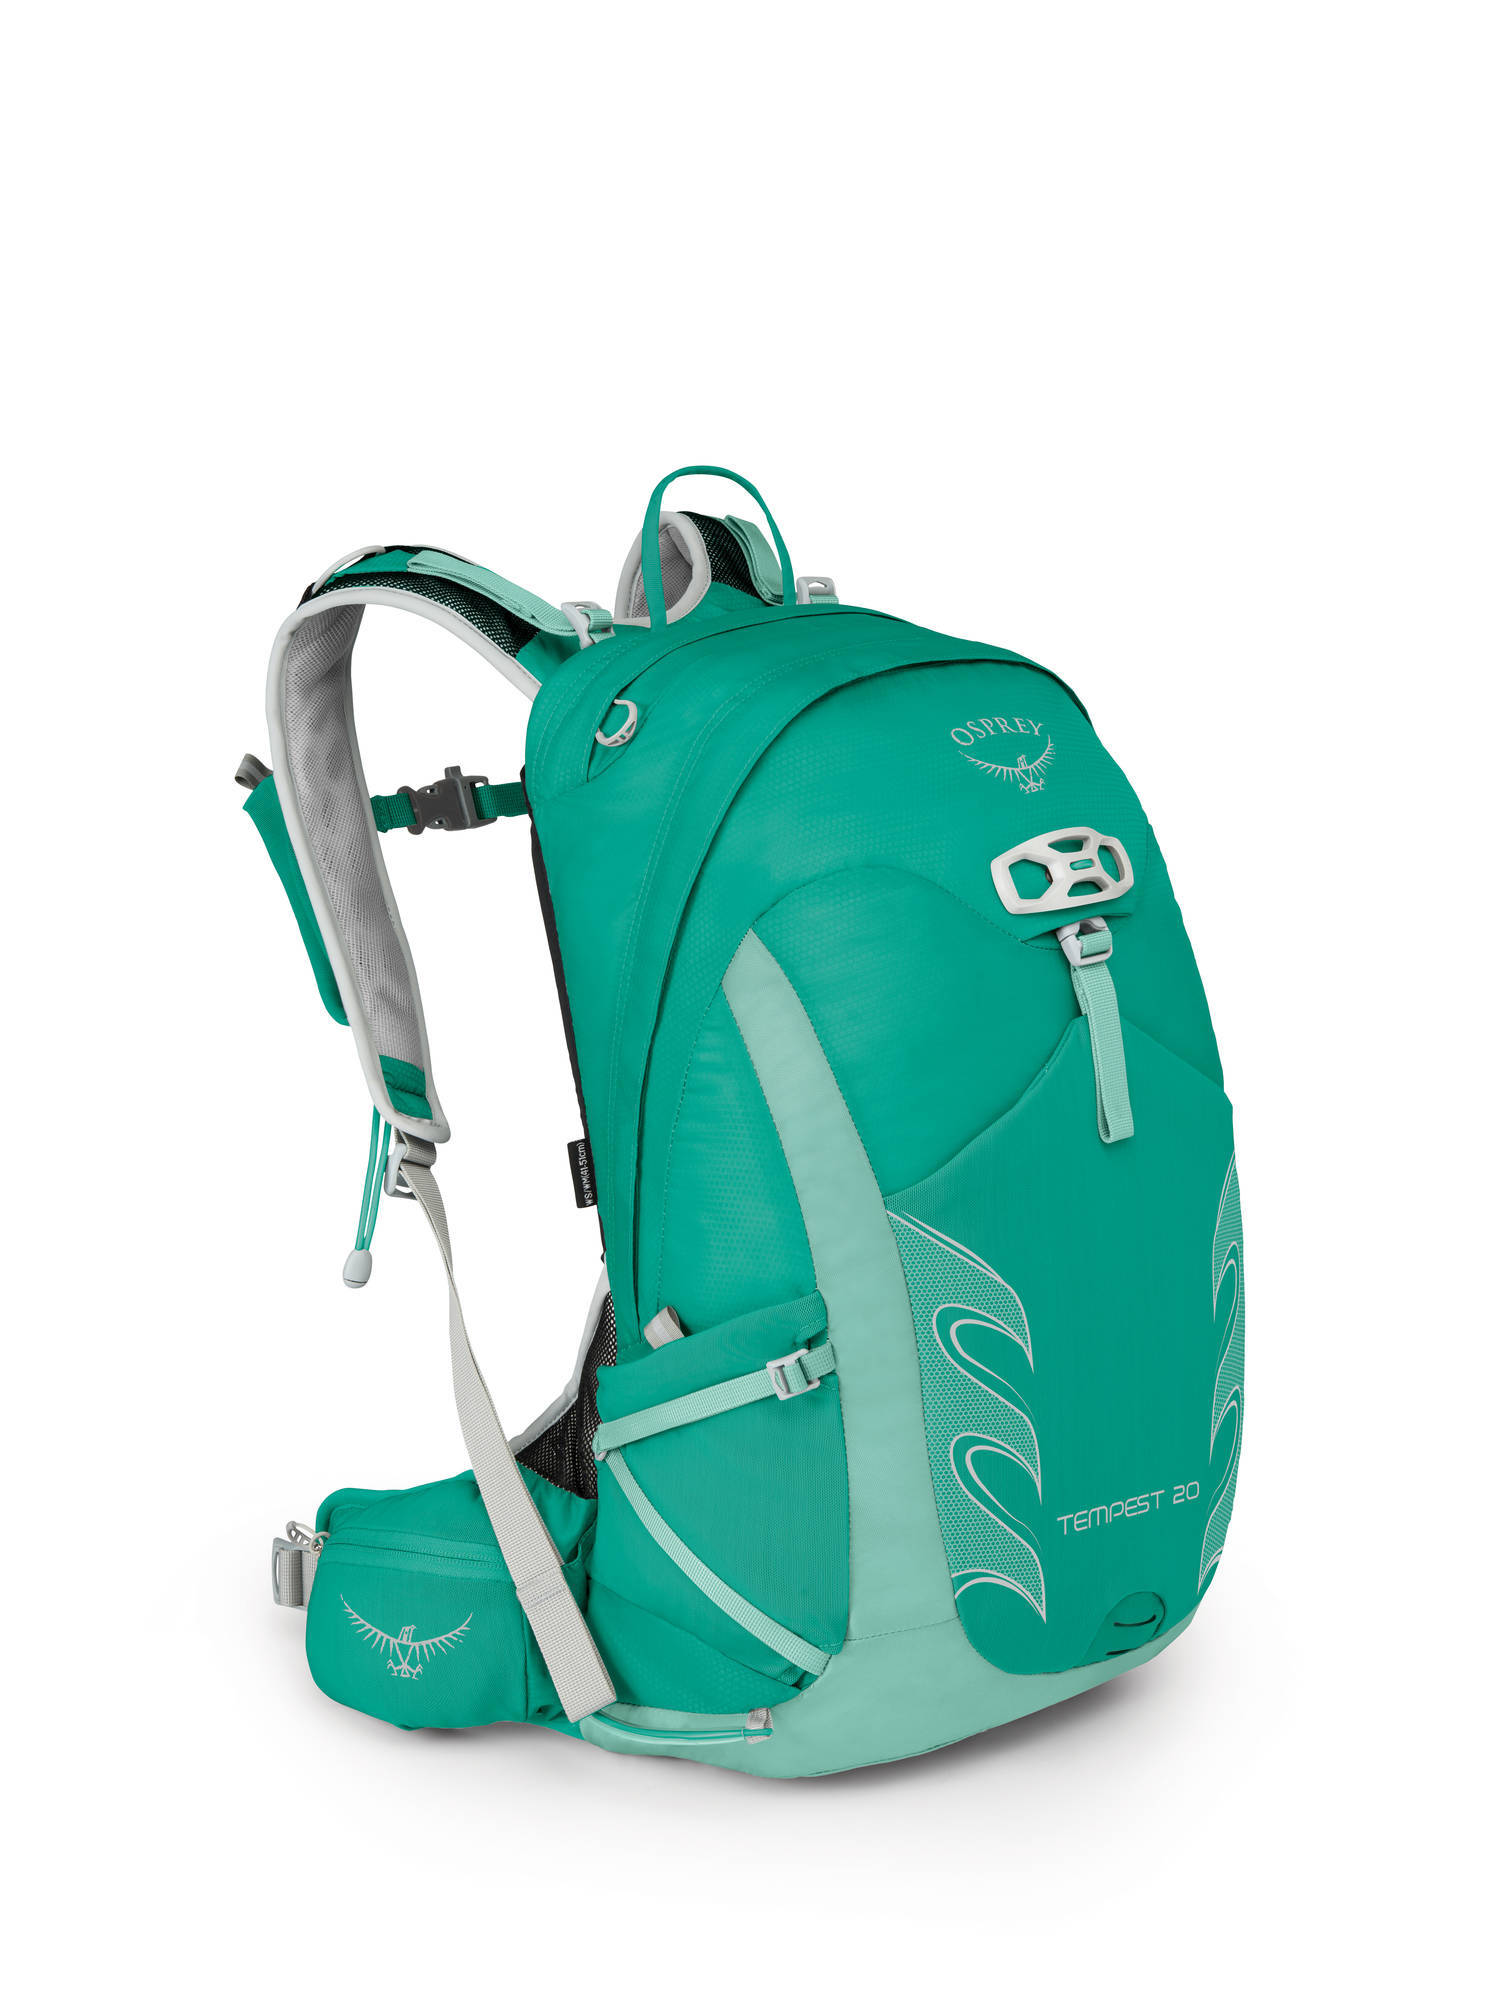 Туристические рюкзаки Рюкзак Osprey Tempest 20 Tempest_20_S17_Side_Lucent_Green_web.jpg